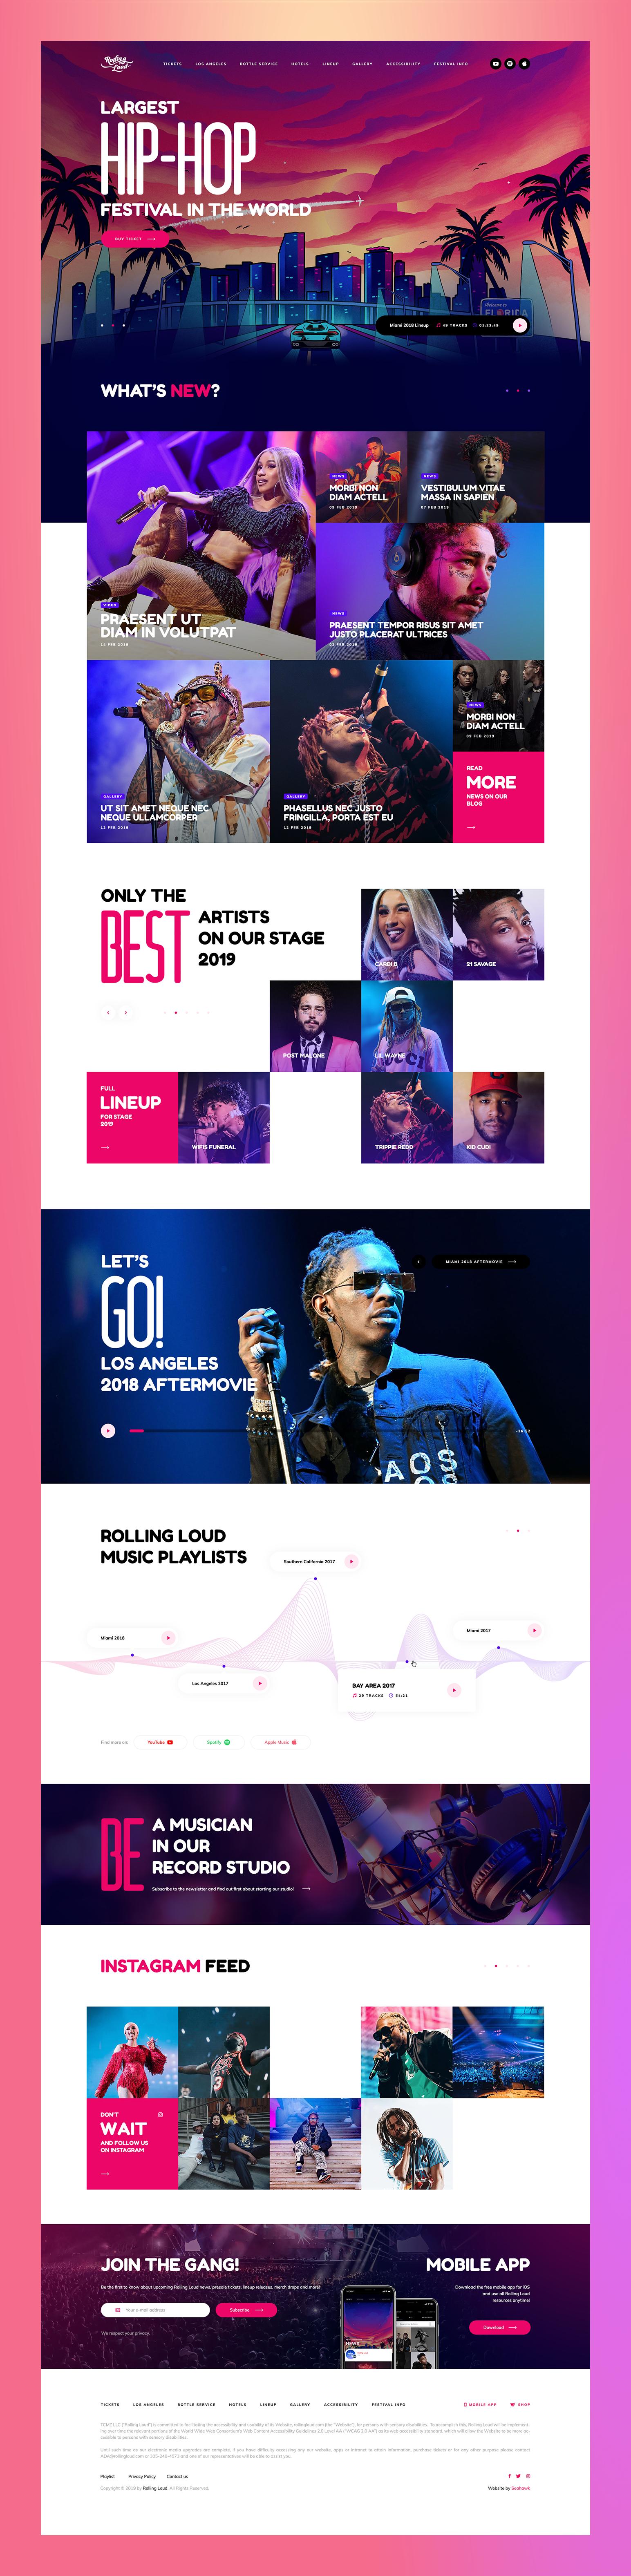 Rolling Loud Best Landing Page Design Clean Web Design Rolling Loud